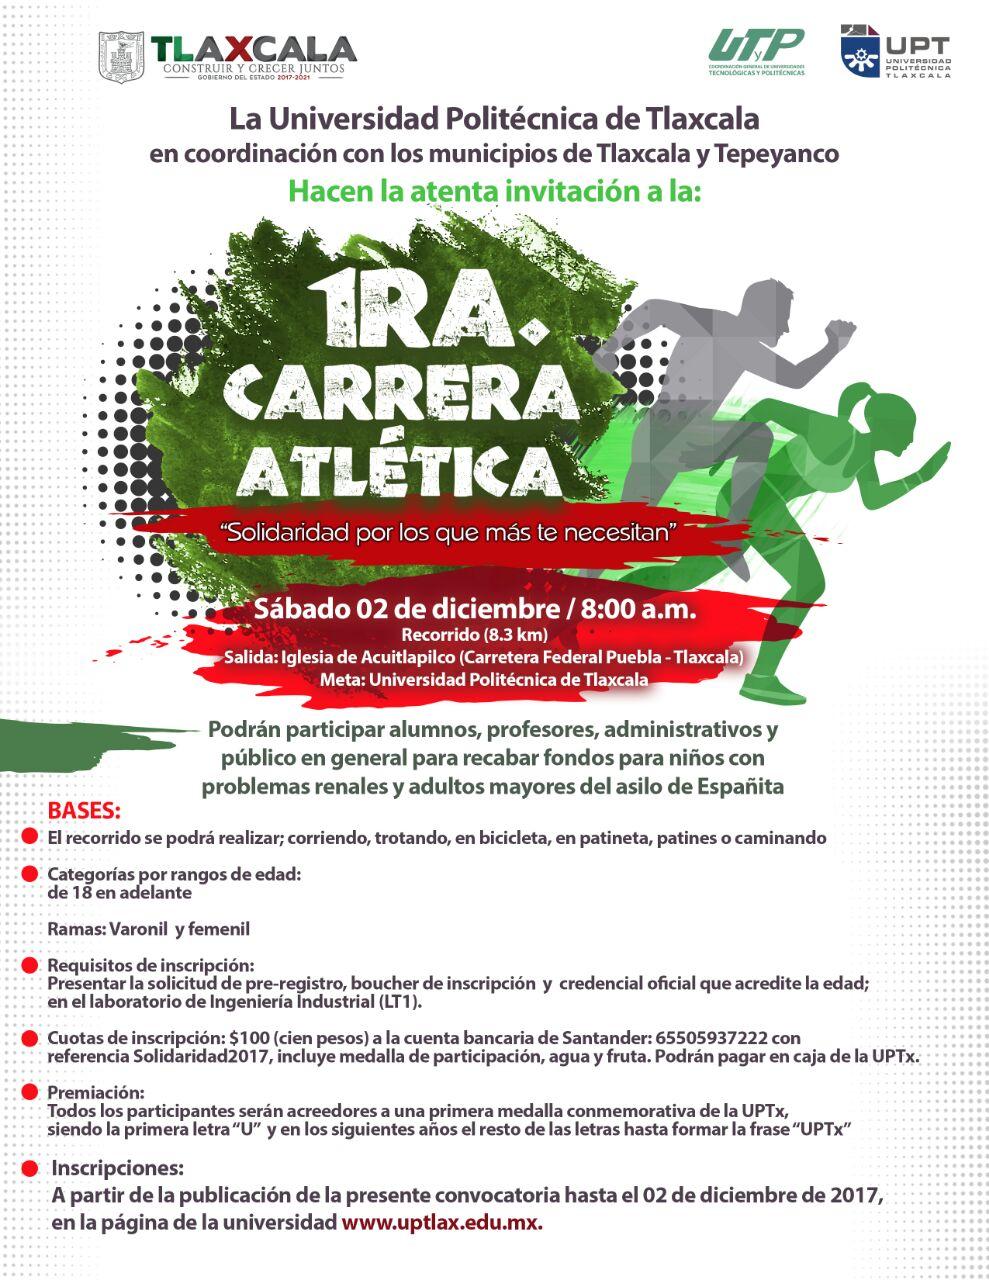 Realizará UPTx 1era Carrera Atlética